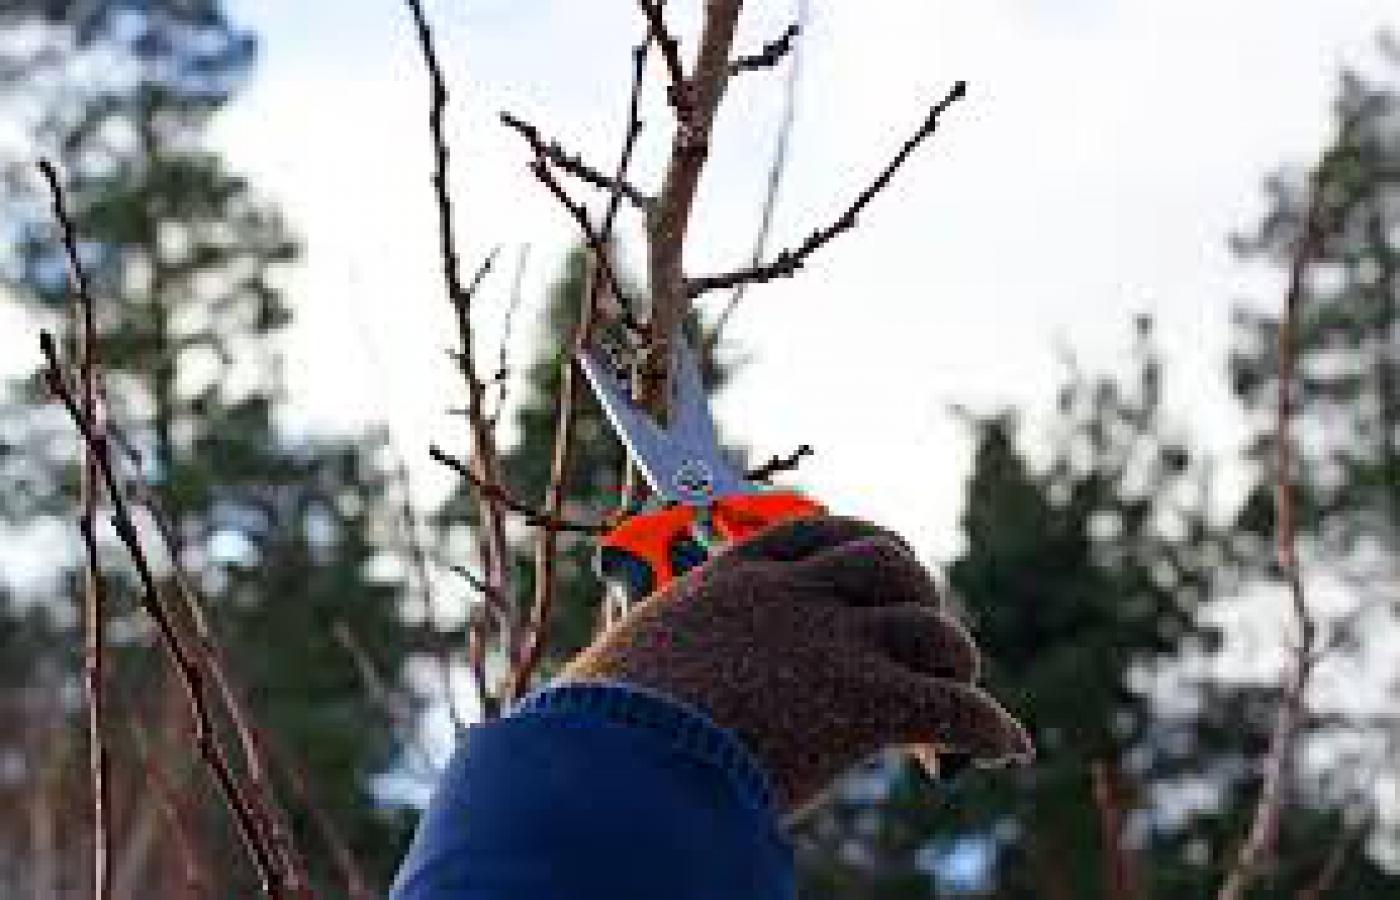 Simple rose pruning rules